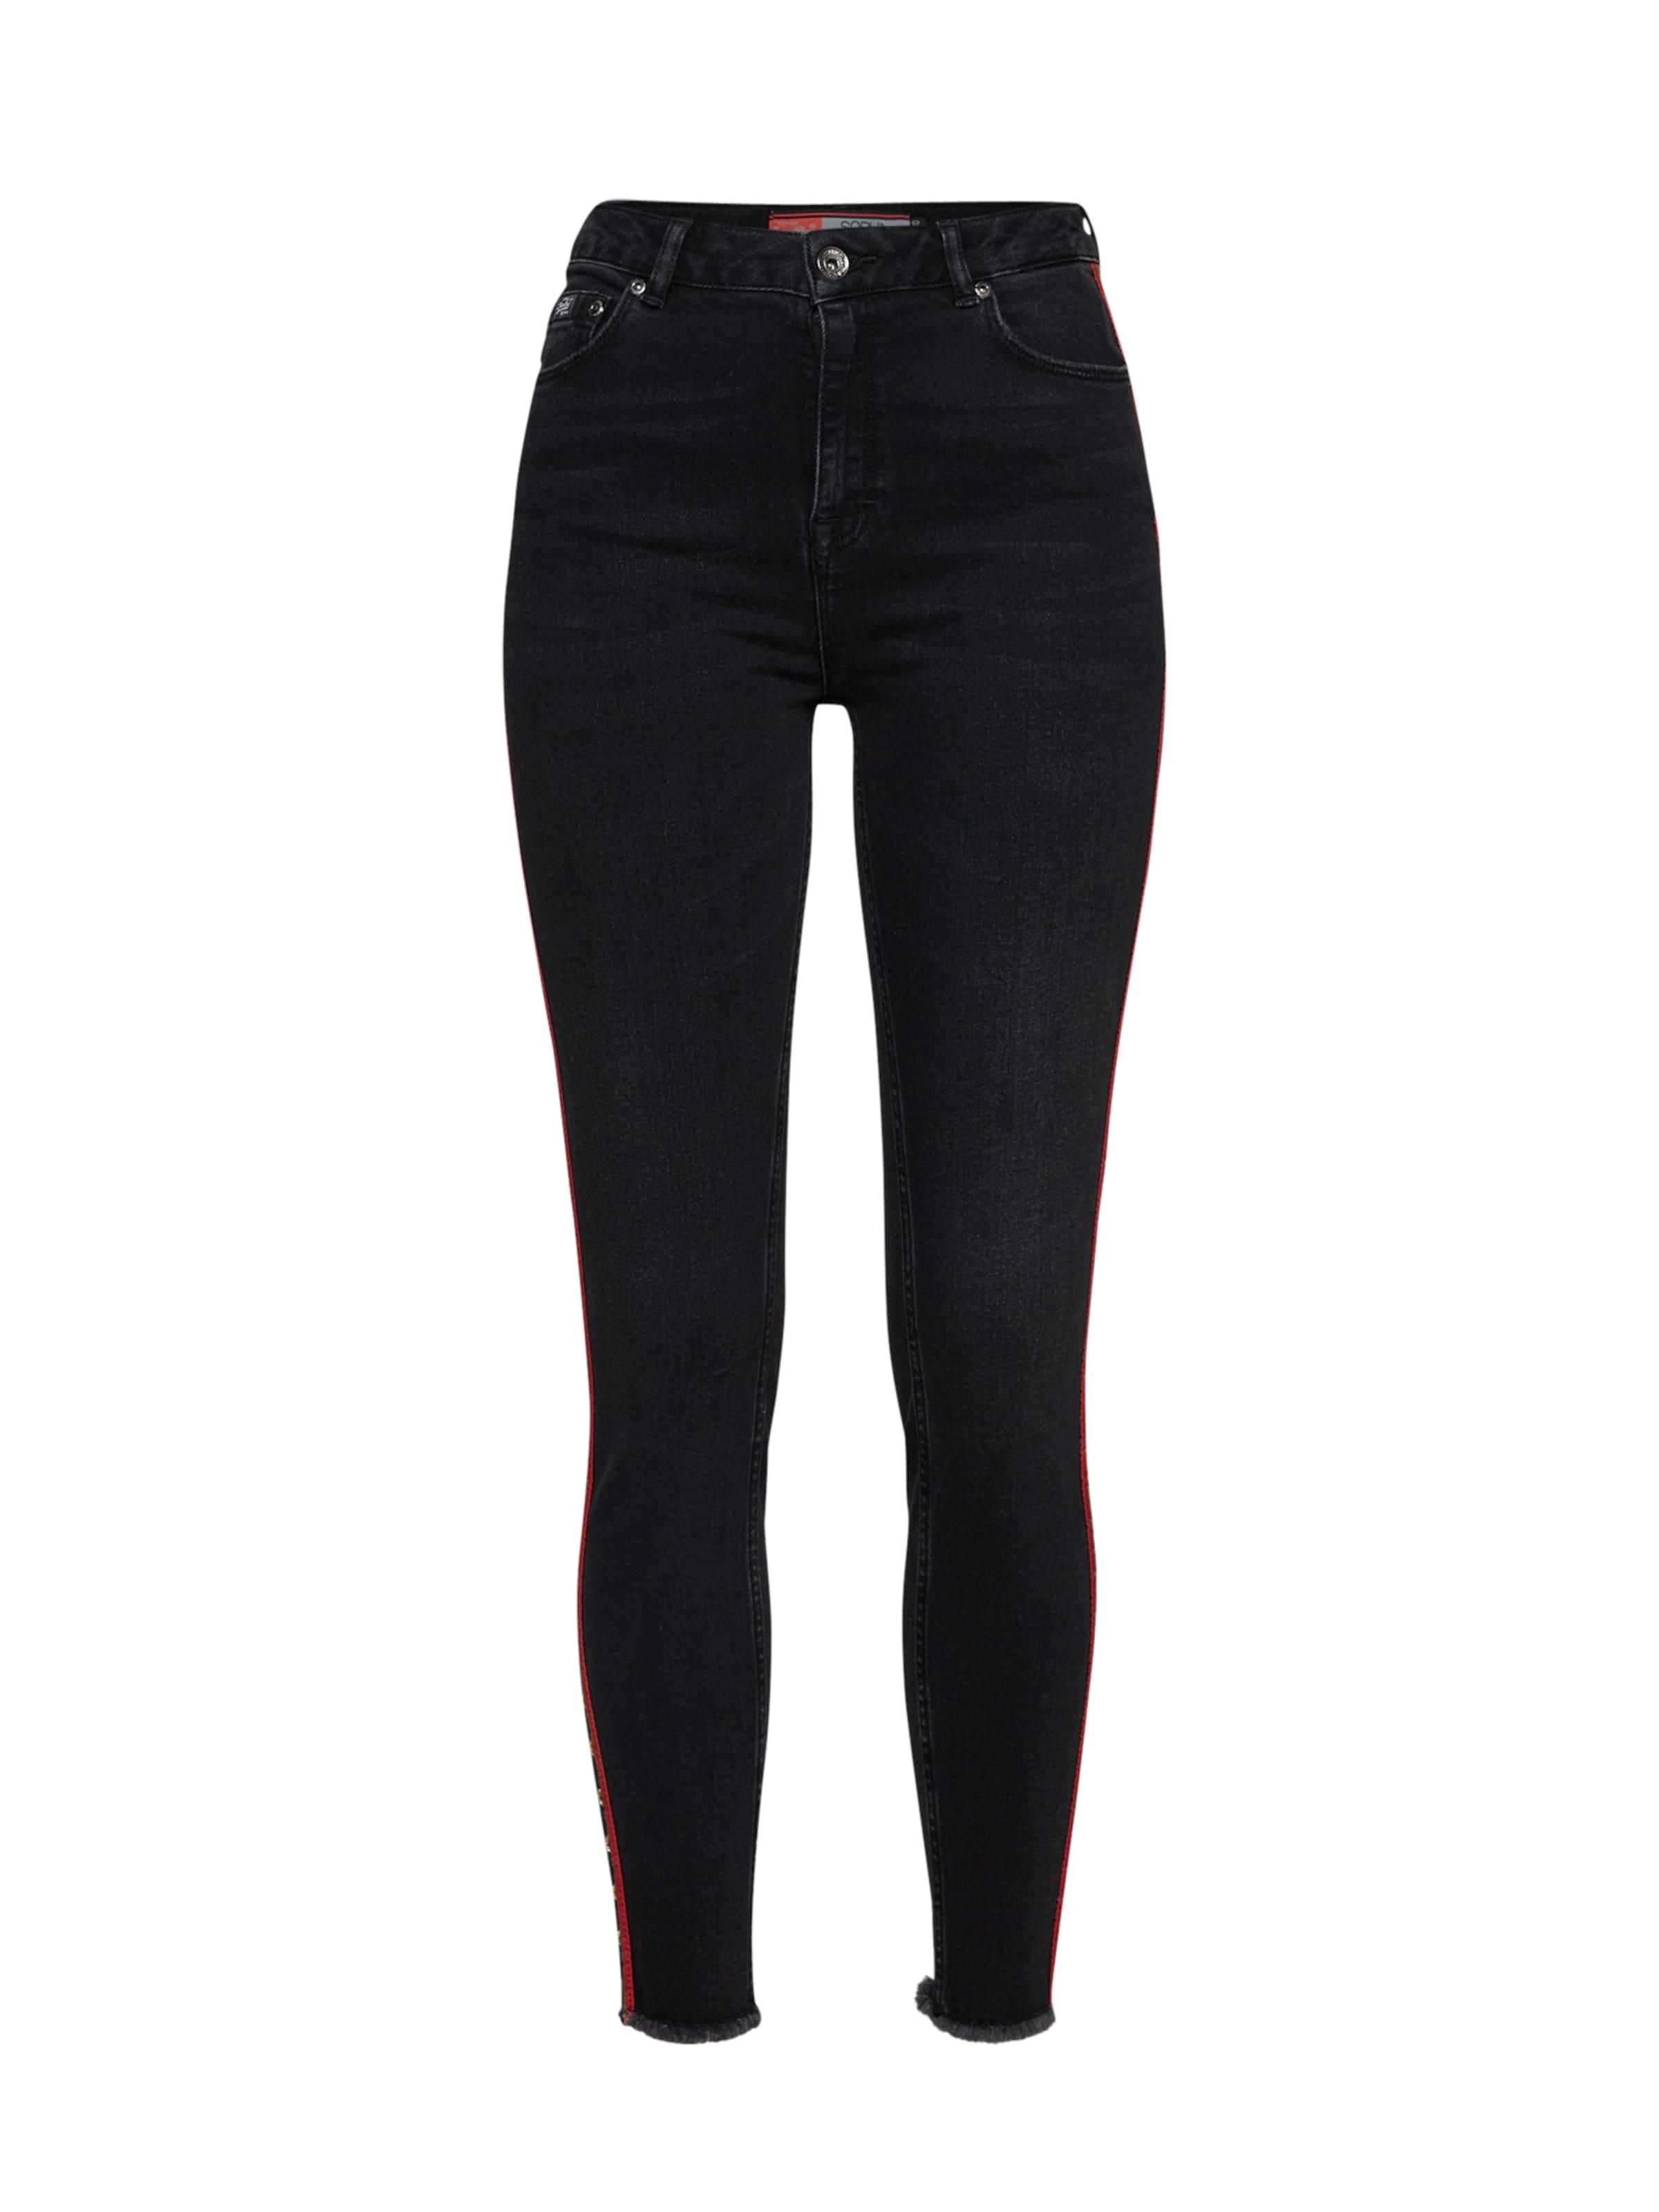 Superdry Jeans In Superdry In RotSchwarz RotSchwarz Jeans RotSchwarz Superdry Jeans In H2EID9